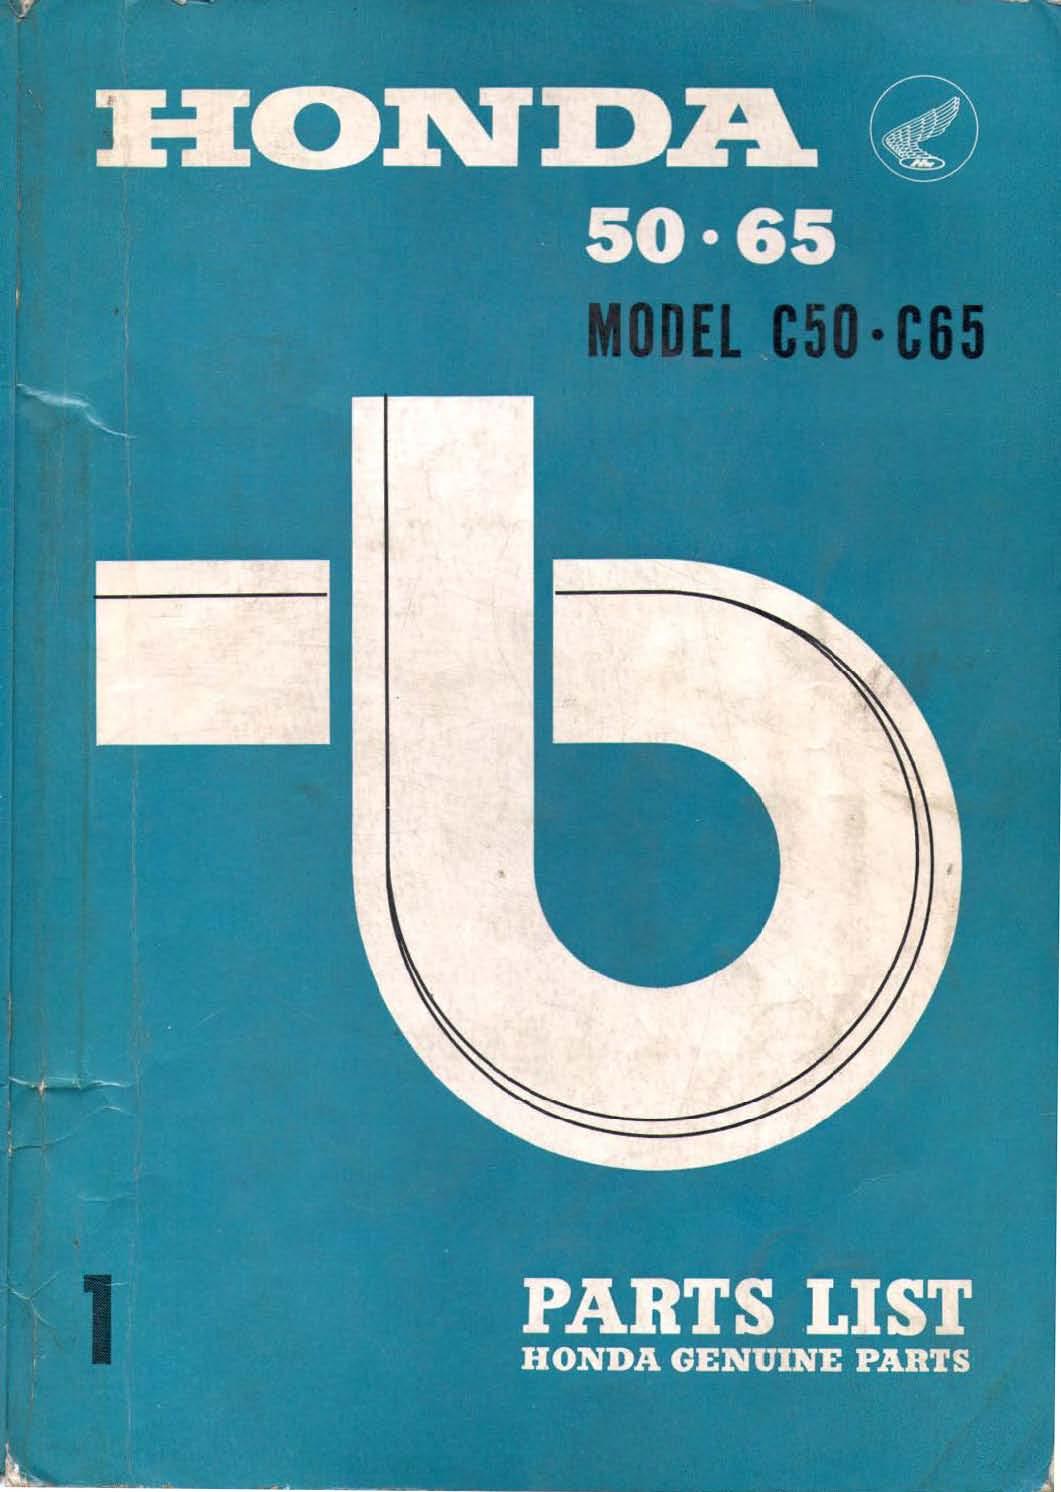 Parts list for Honda C50 (1966)